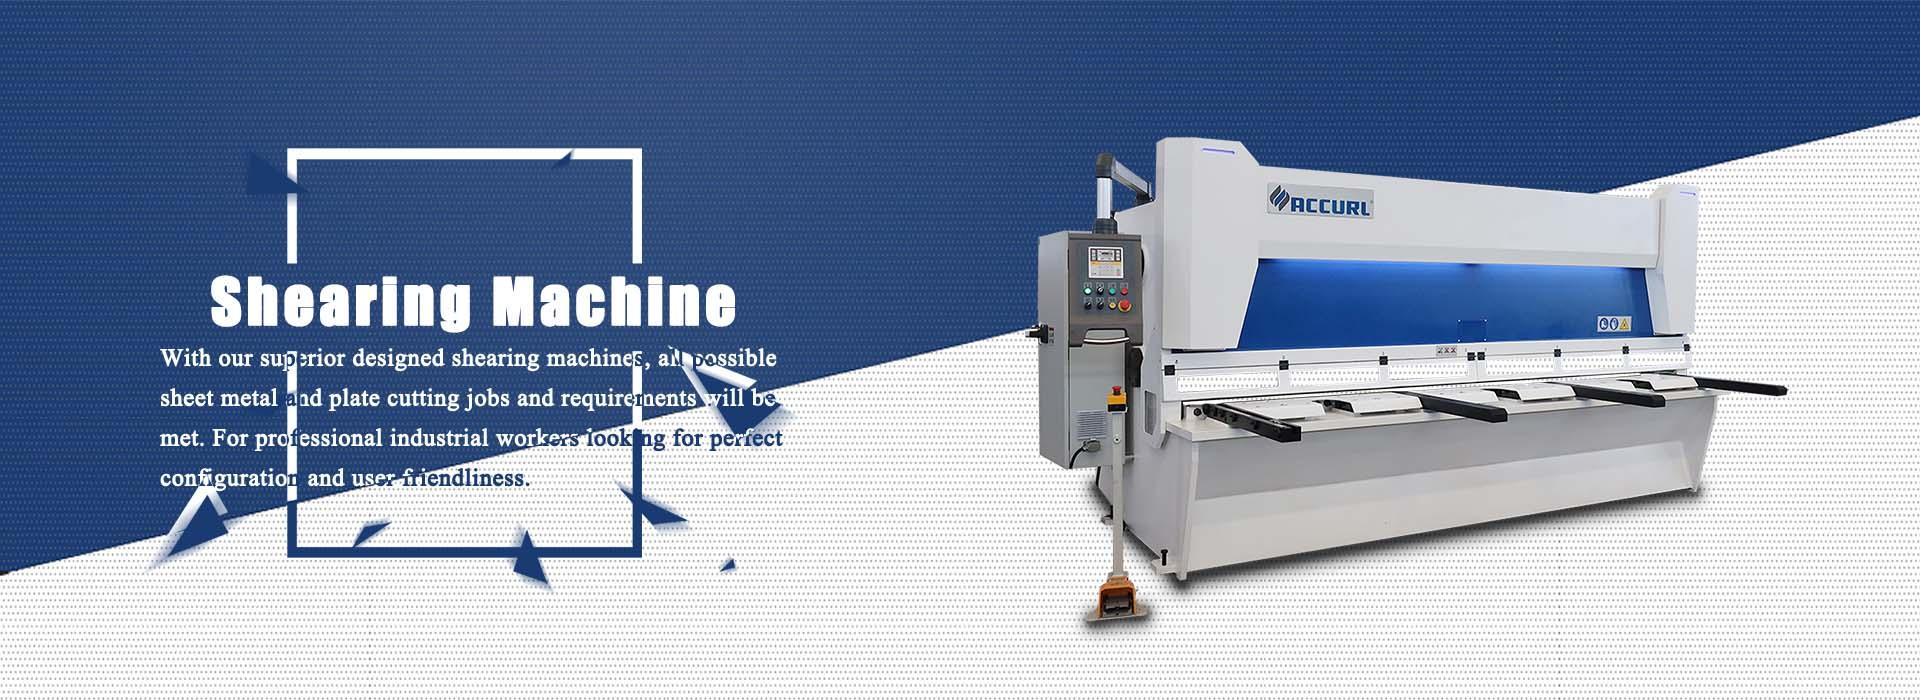 Shearing Machine Banner